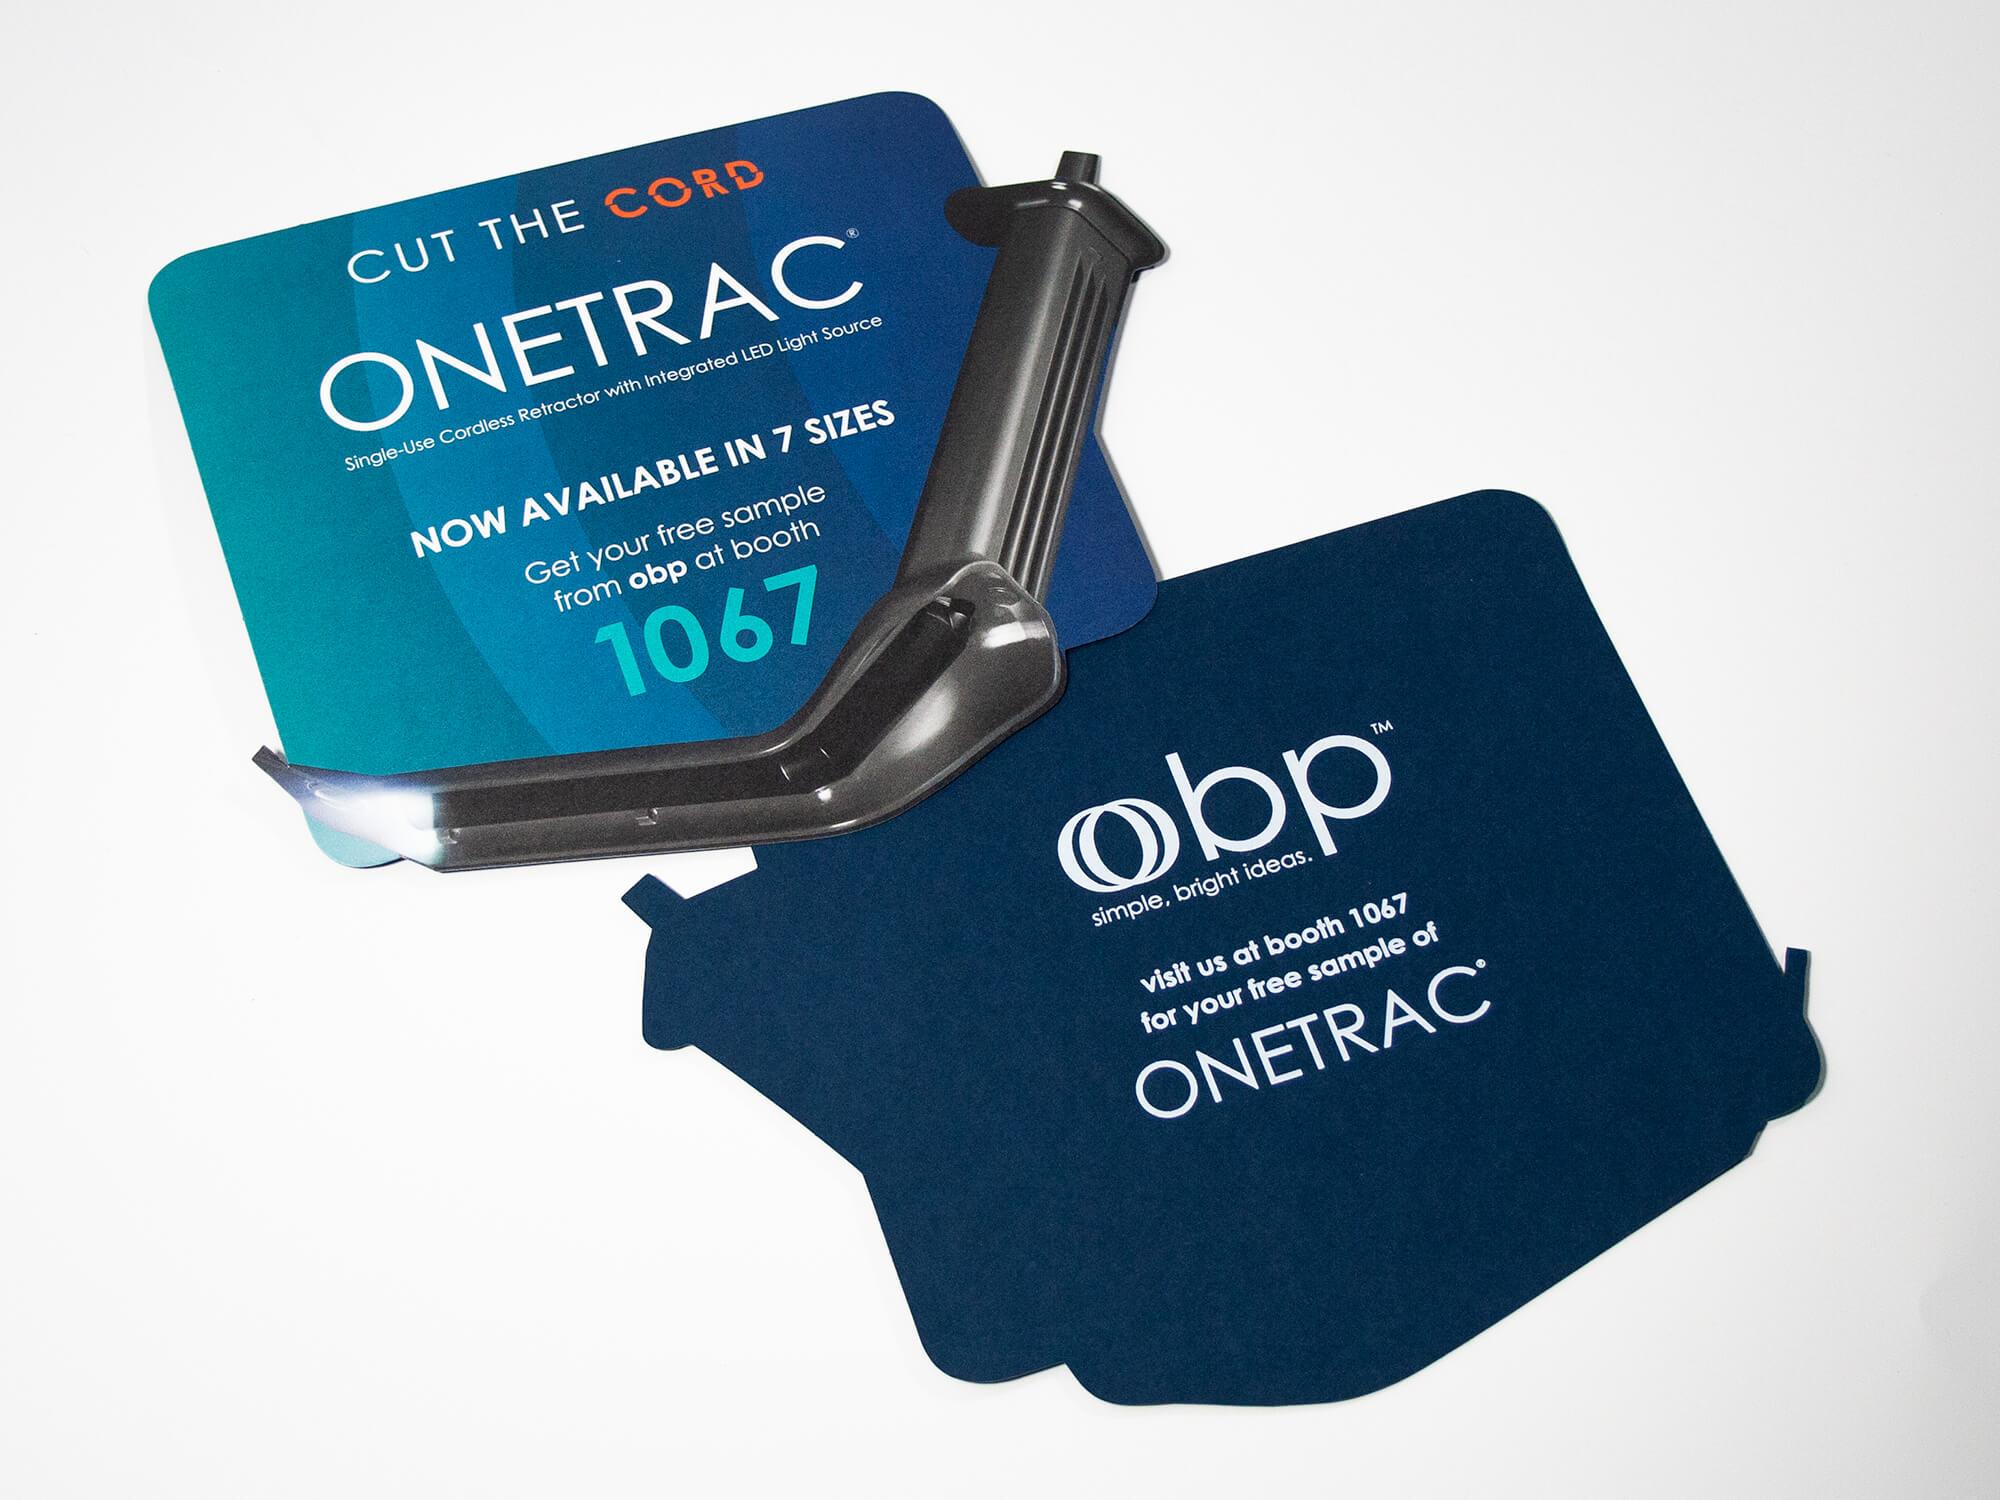 obp ONETRAC Insert